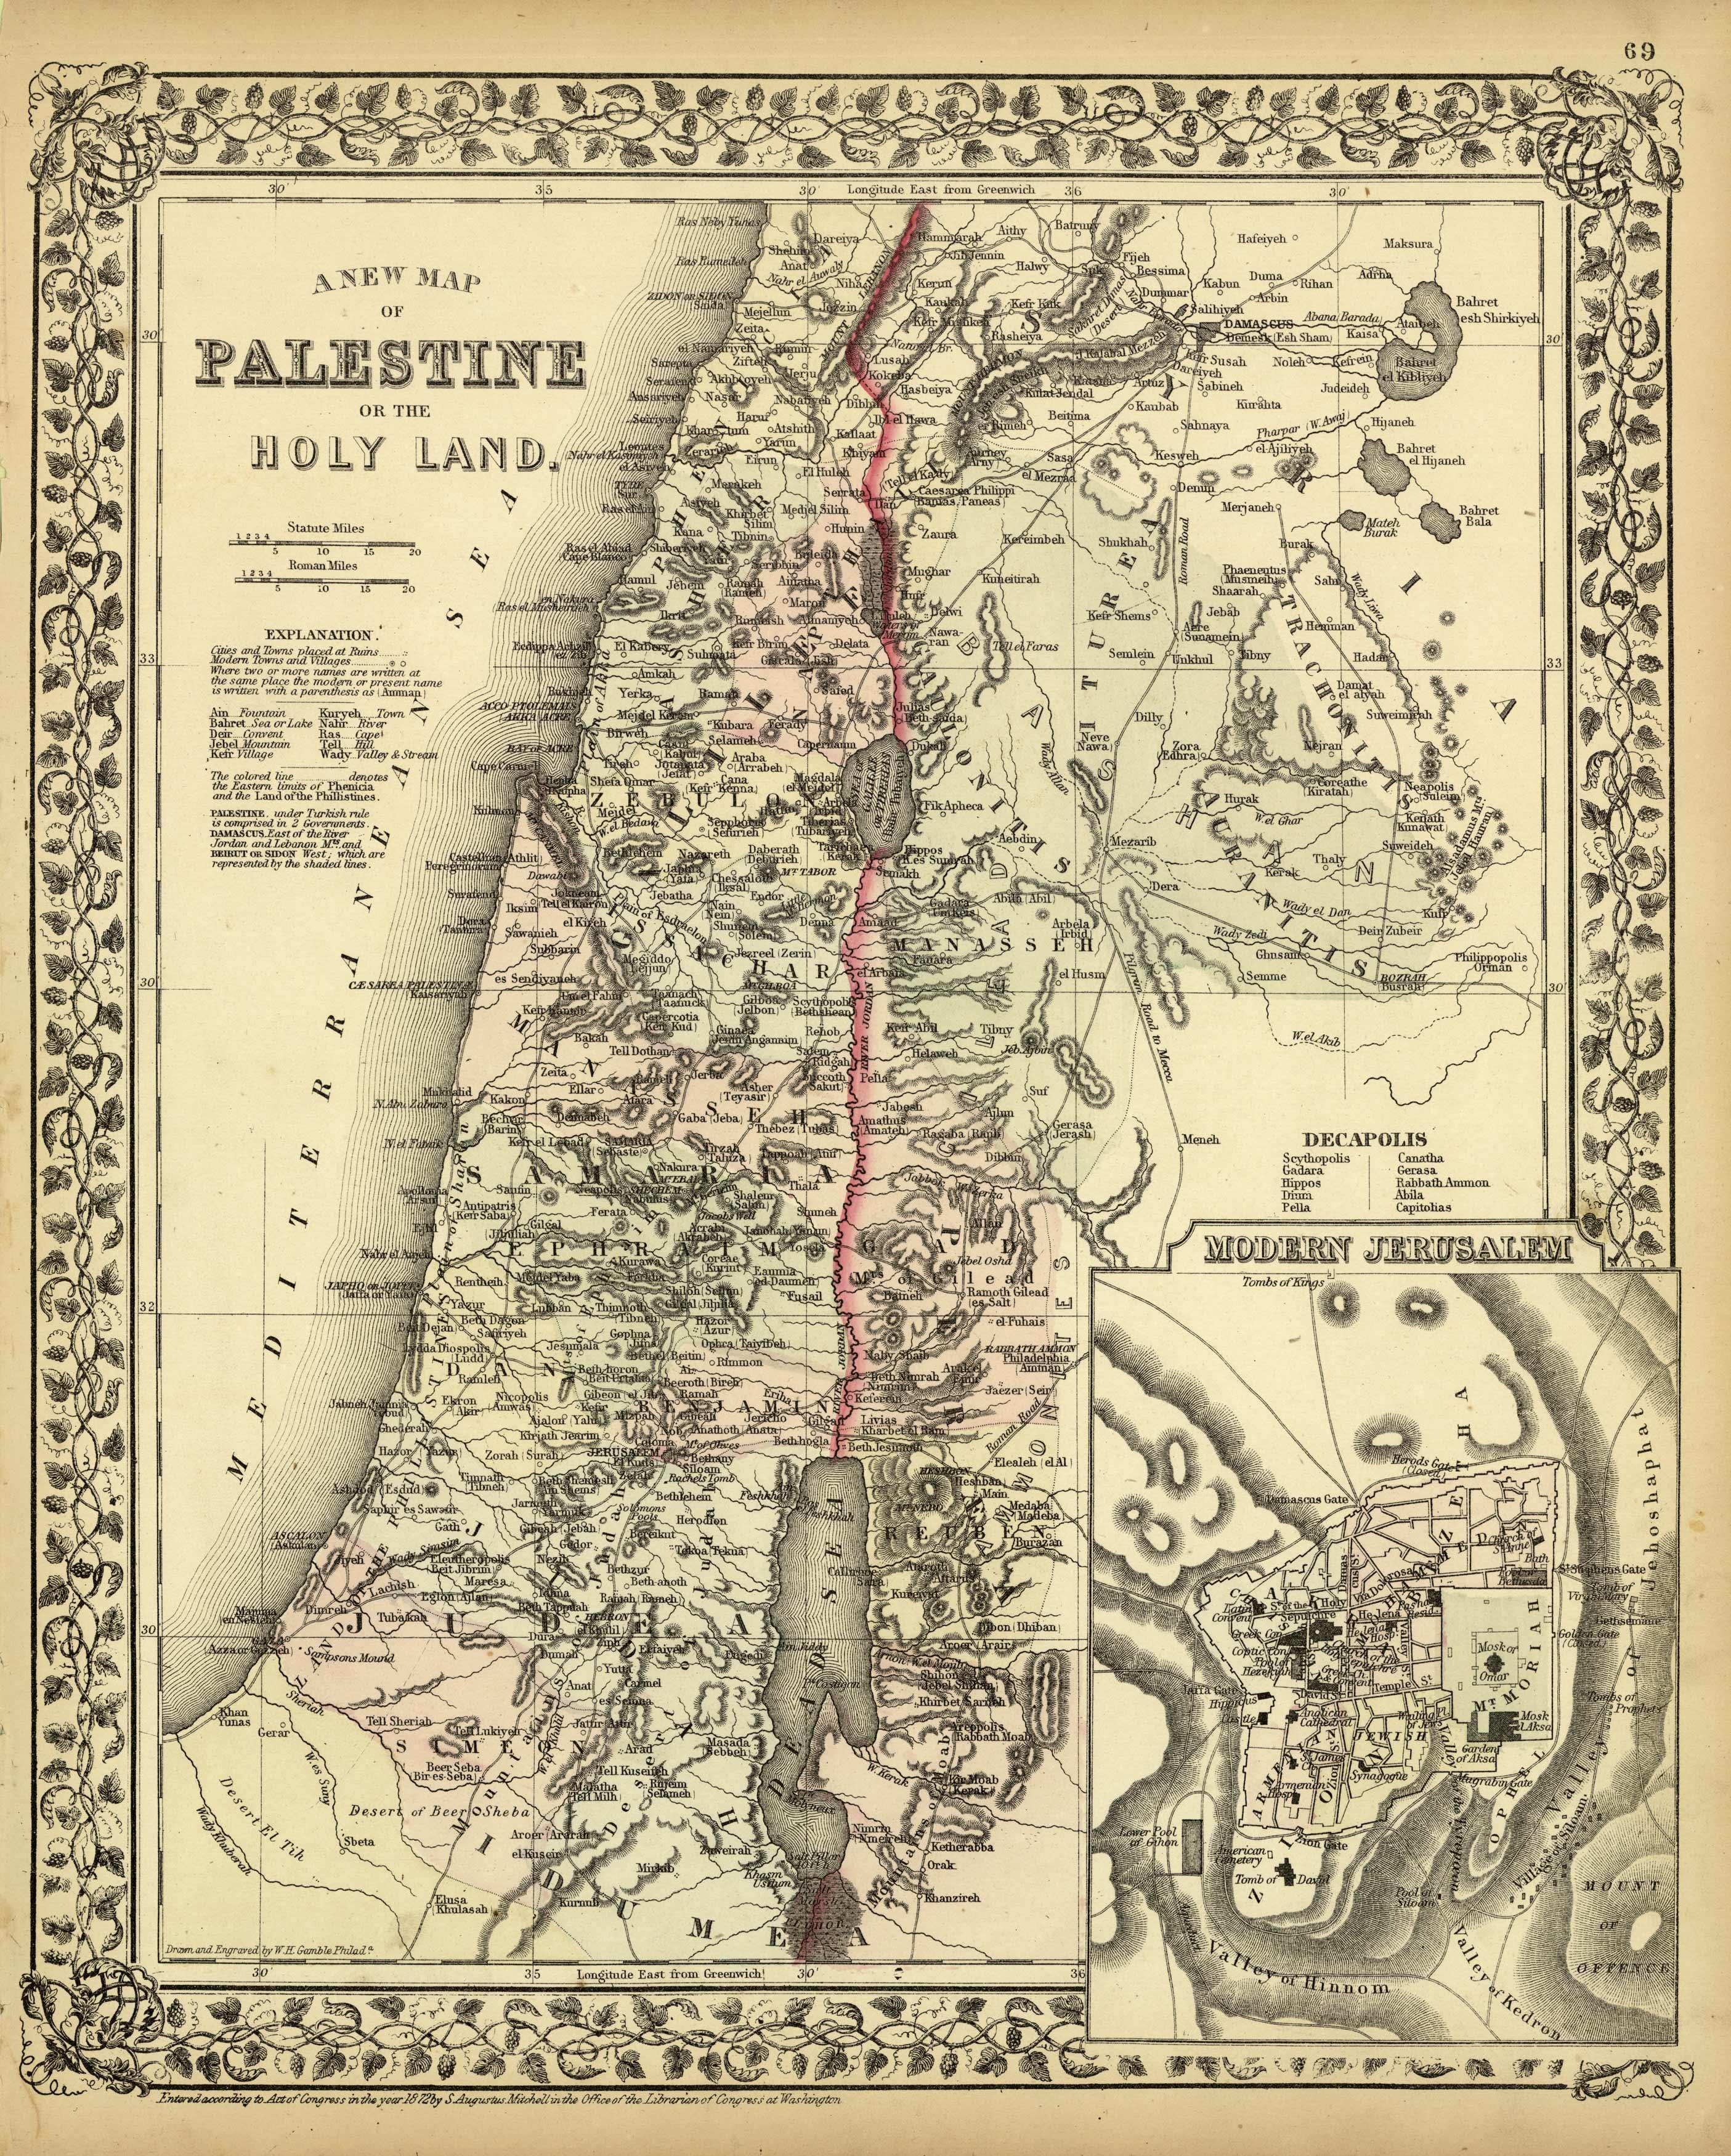 A New Map of Palestine or the Holy Land / Modern Jersusalem